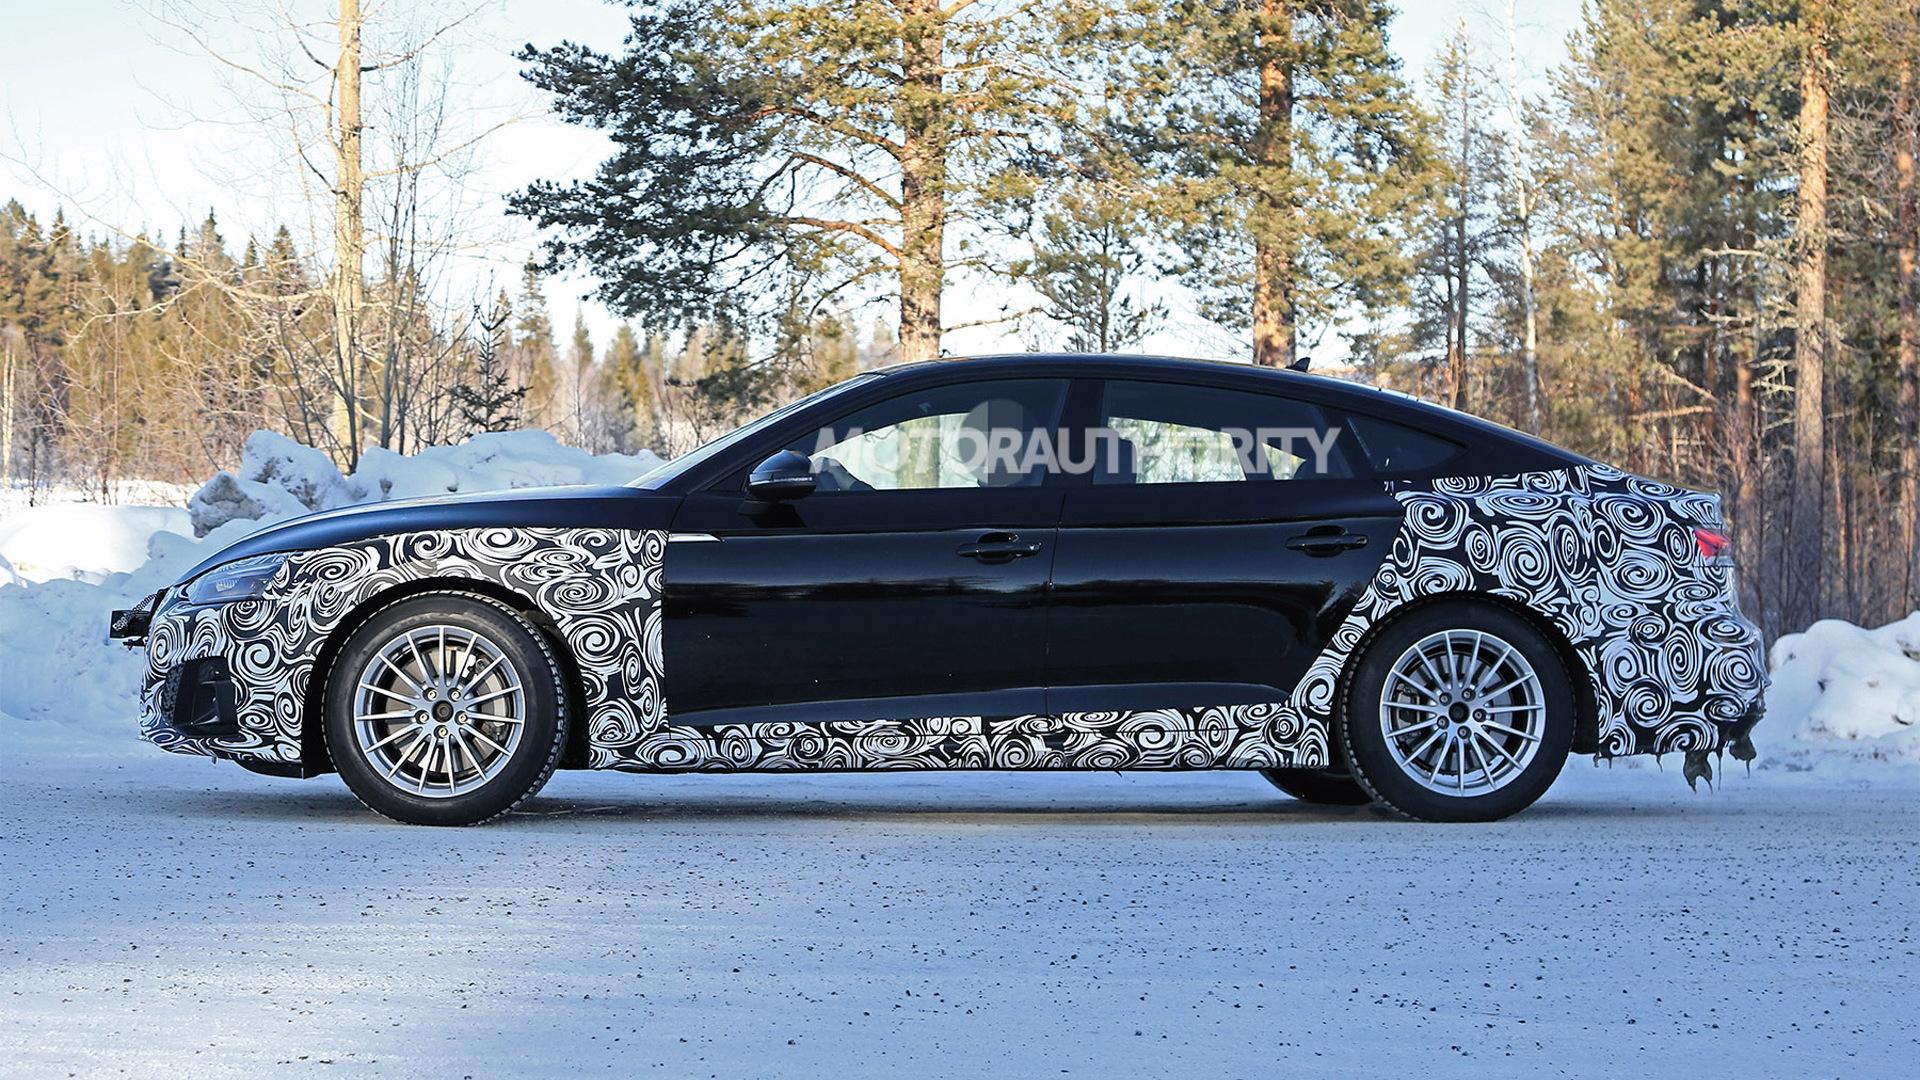 2021 Audi A5 Sportback facelift spy shots - Image via S. Baldauf/SB-Medien